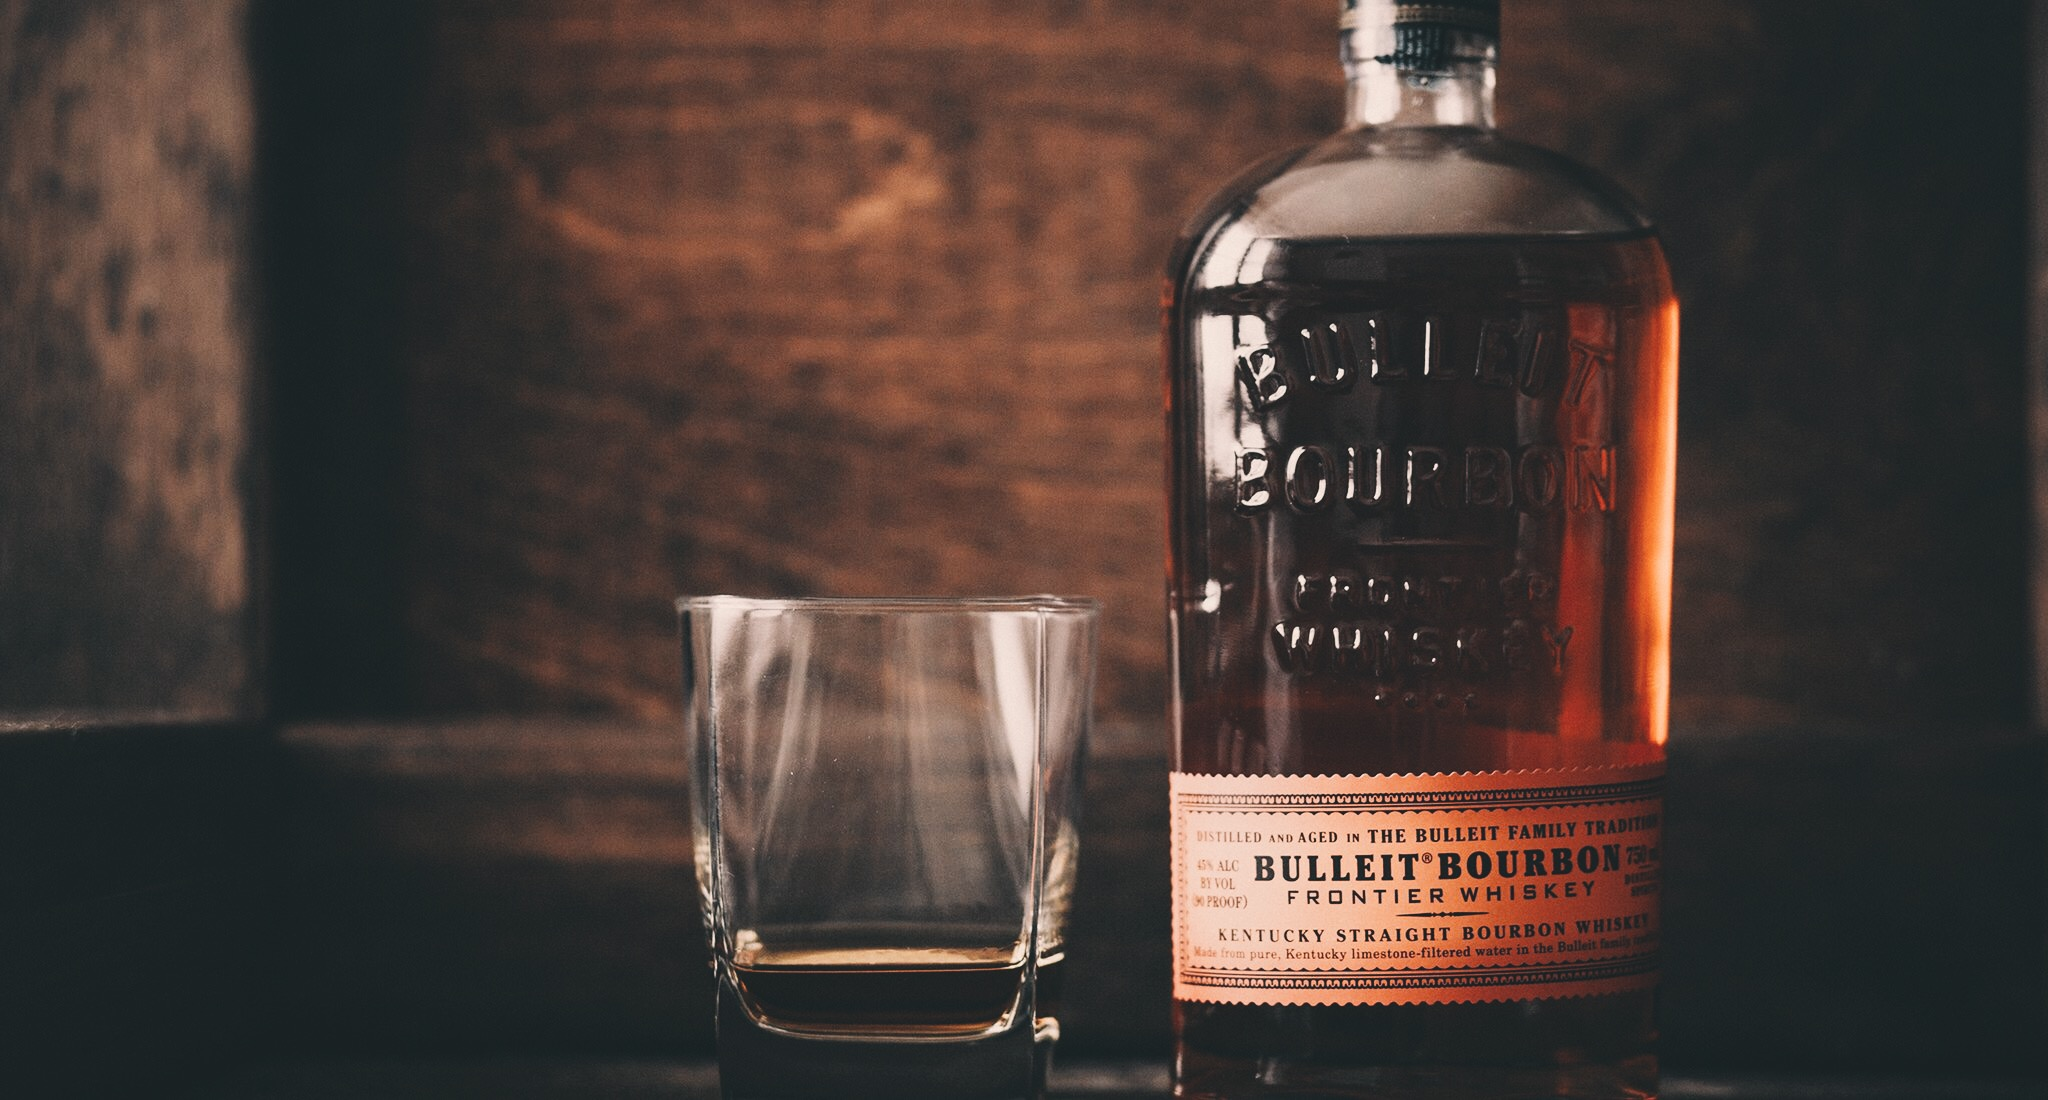 bulleit-bourbon-hero.jpg